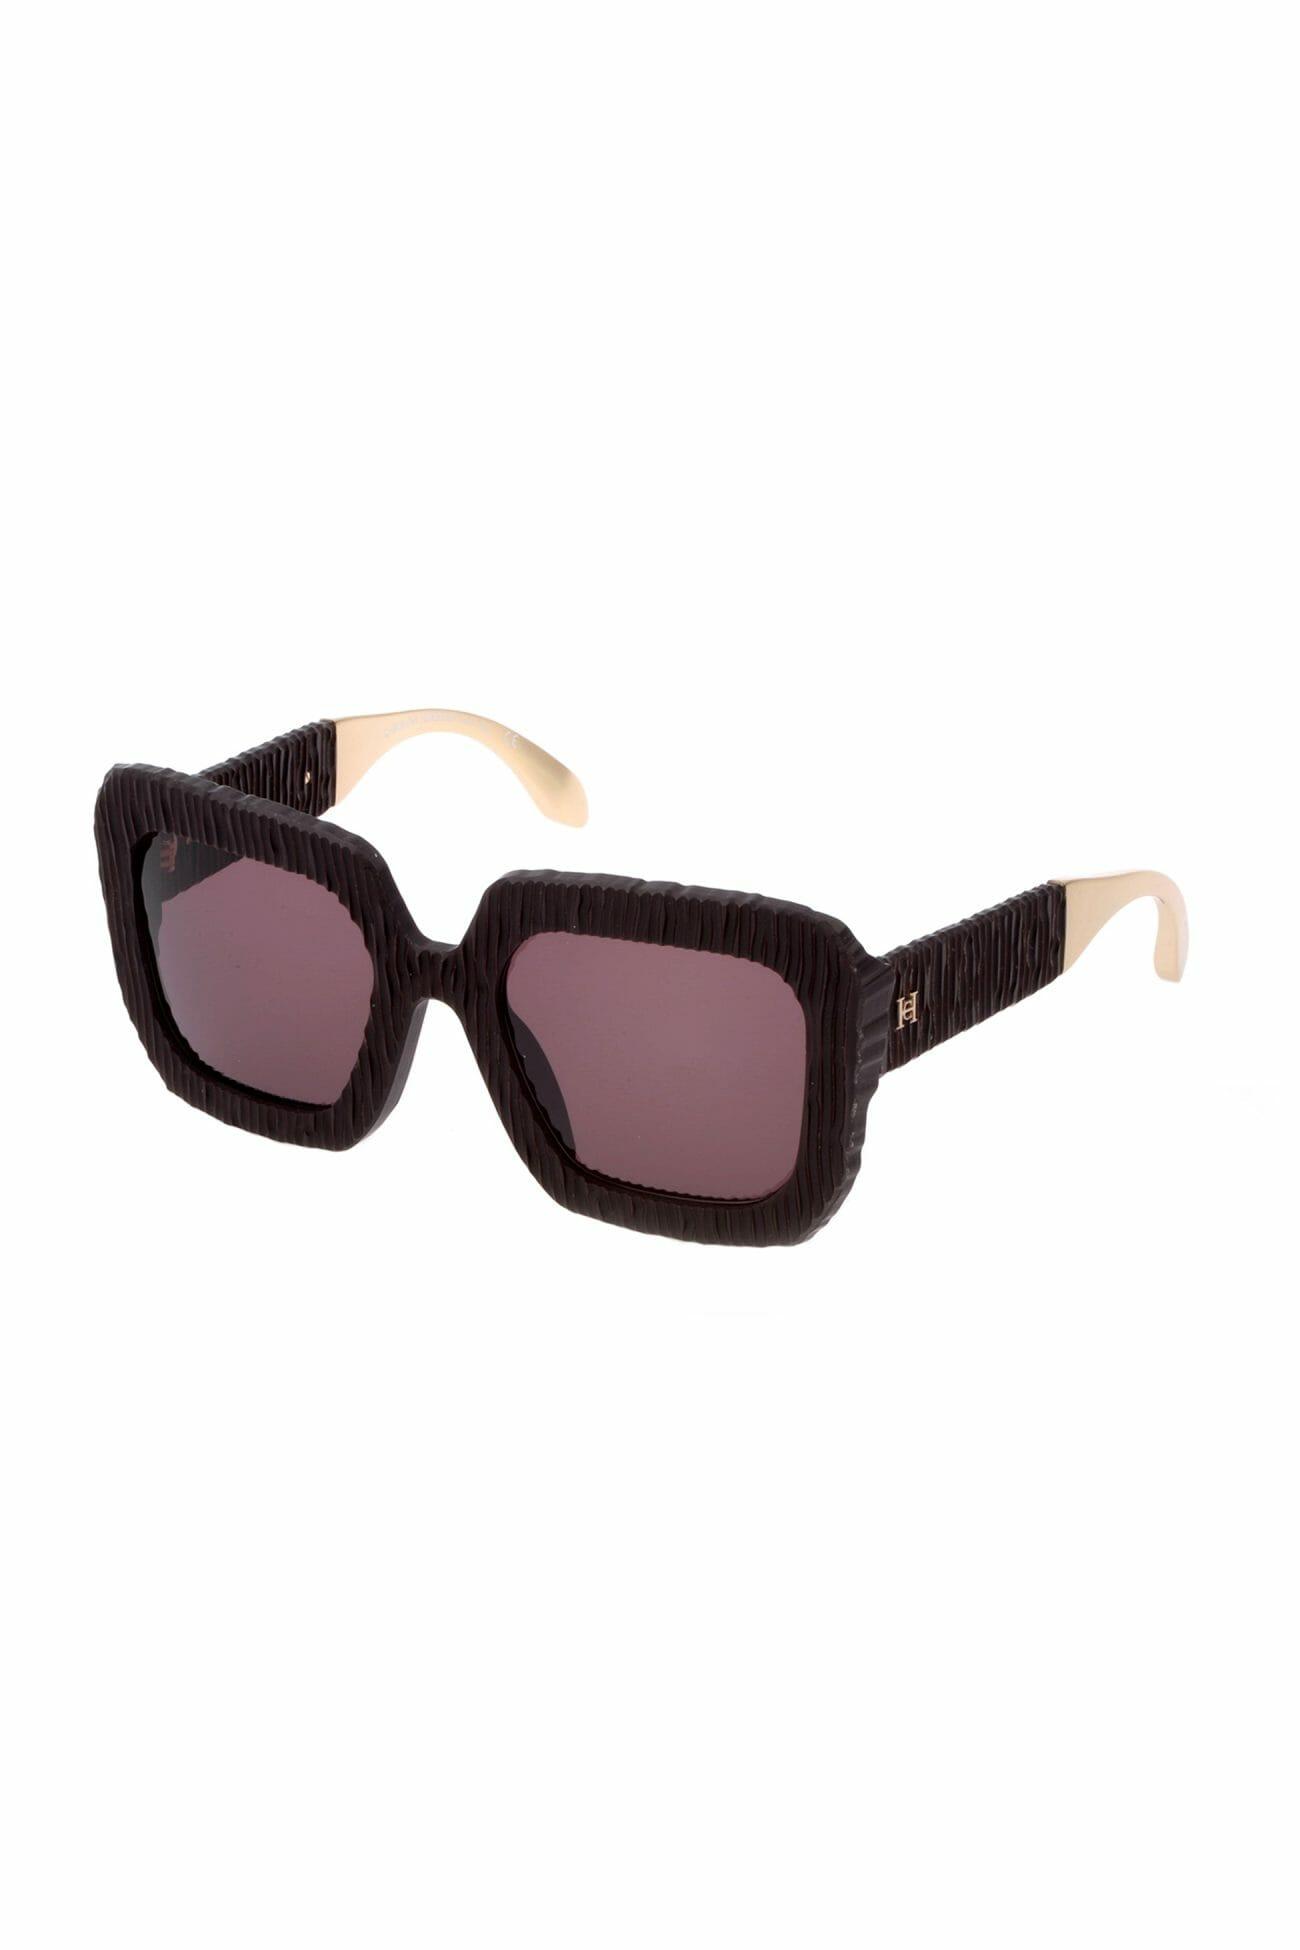 Carolina Herrera Spring sunglasses collection